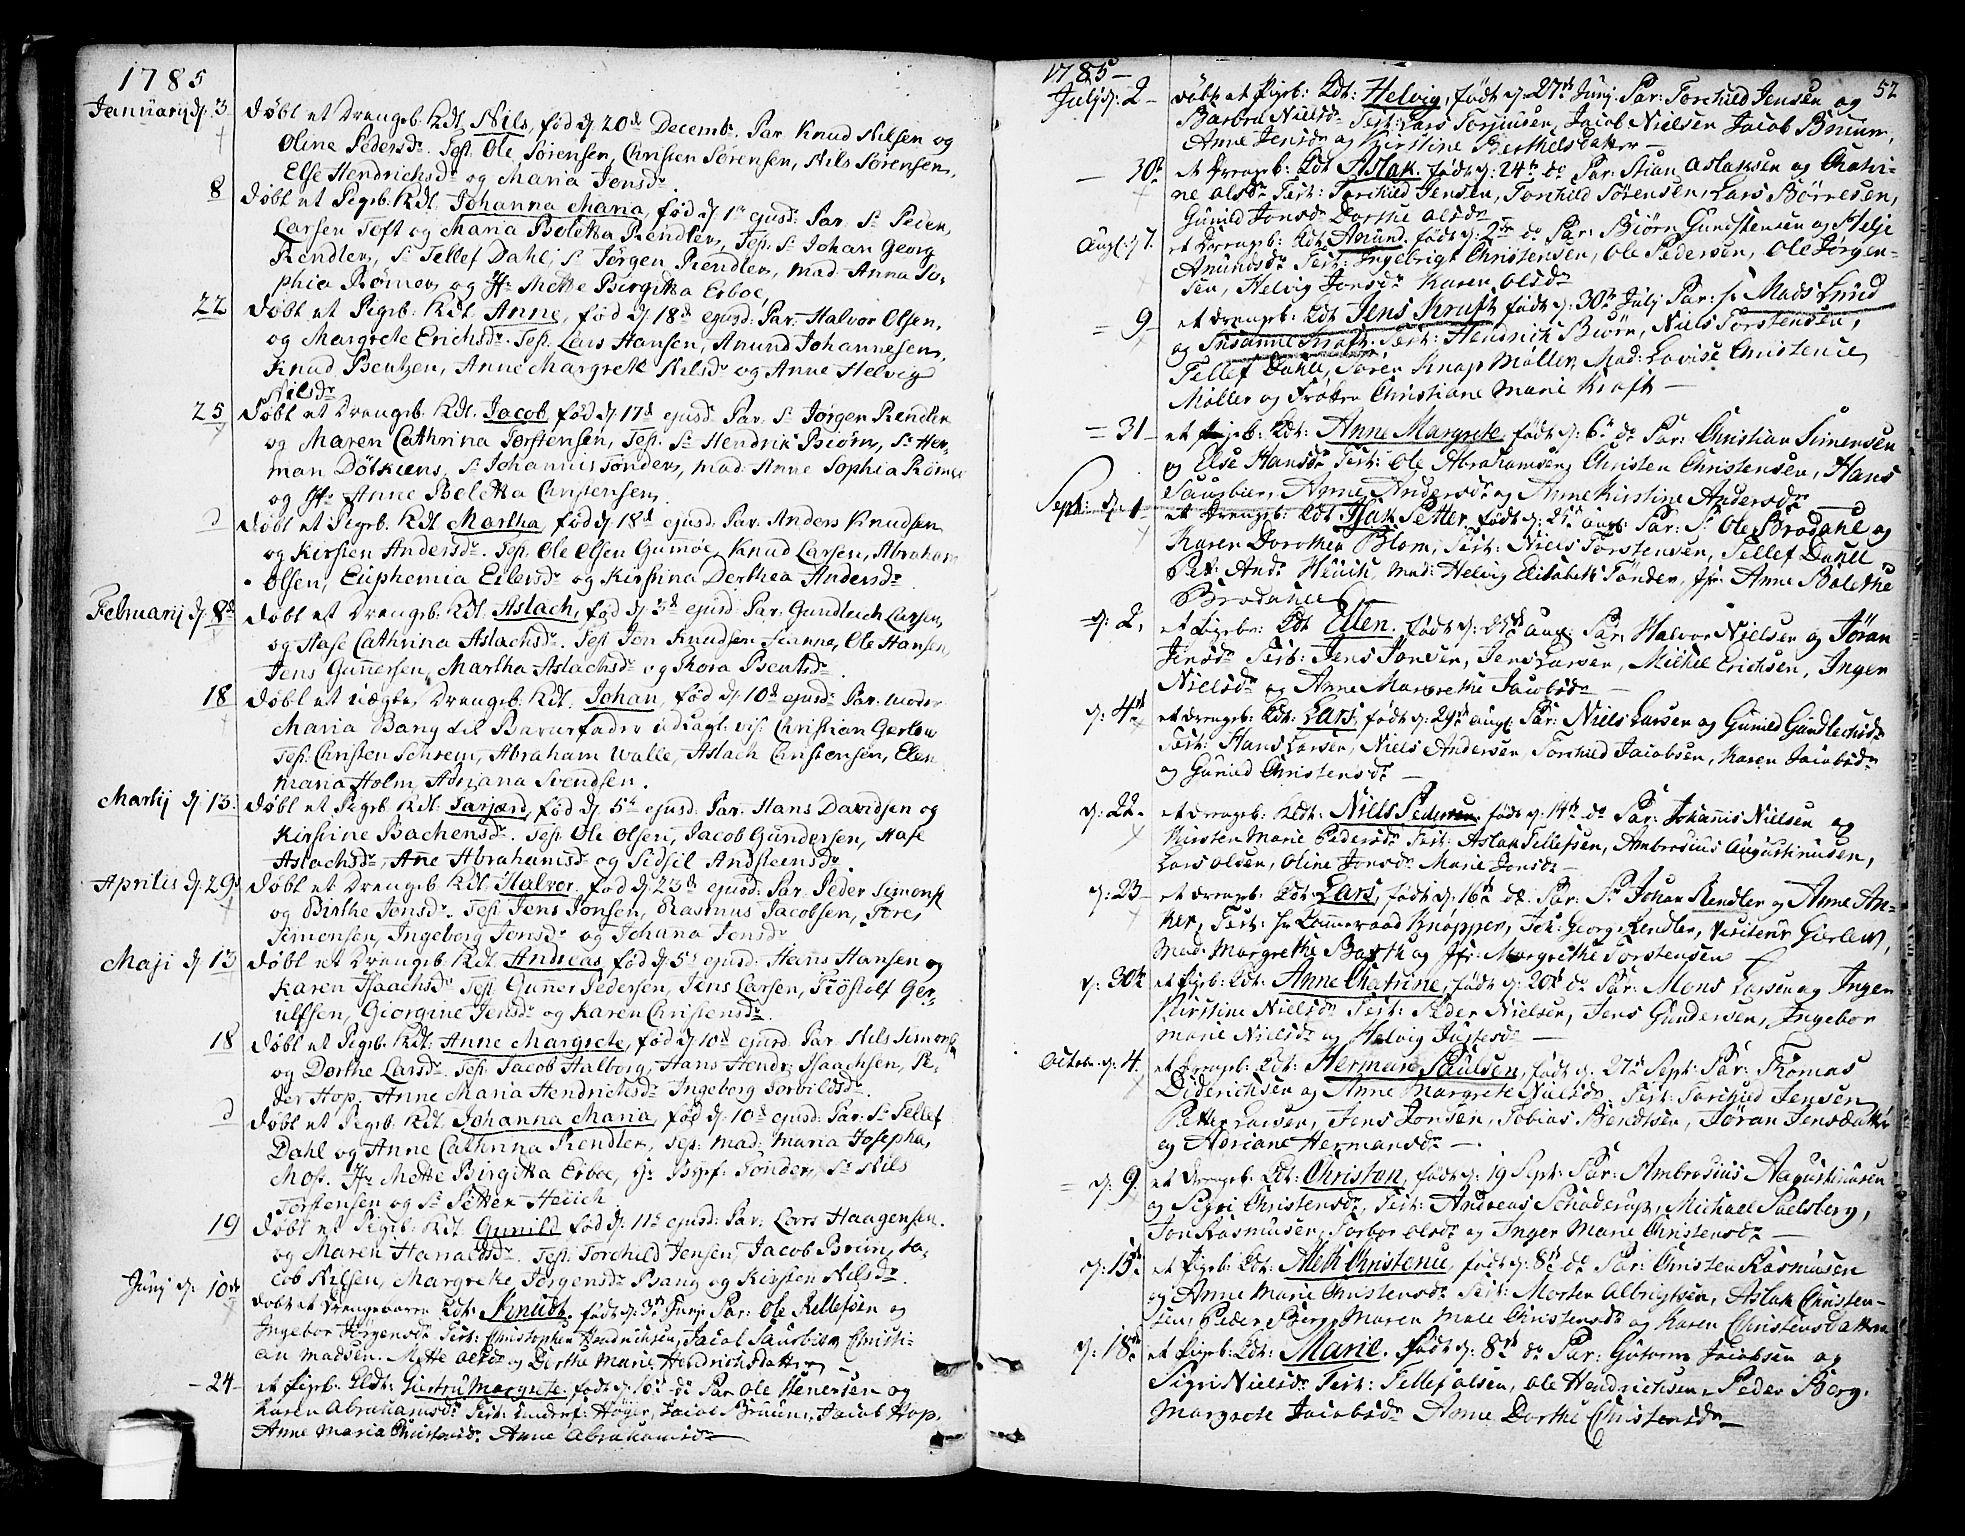 SAKO, Kragerø kirkebøker, F/Fa/L0002: Ministerialbok nr. 2, 1767-1802, s. 52